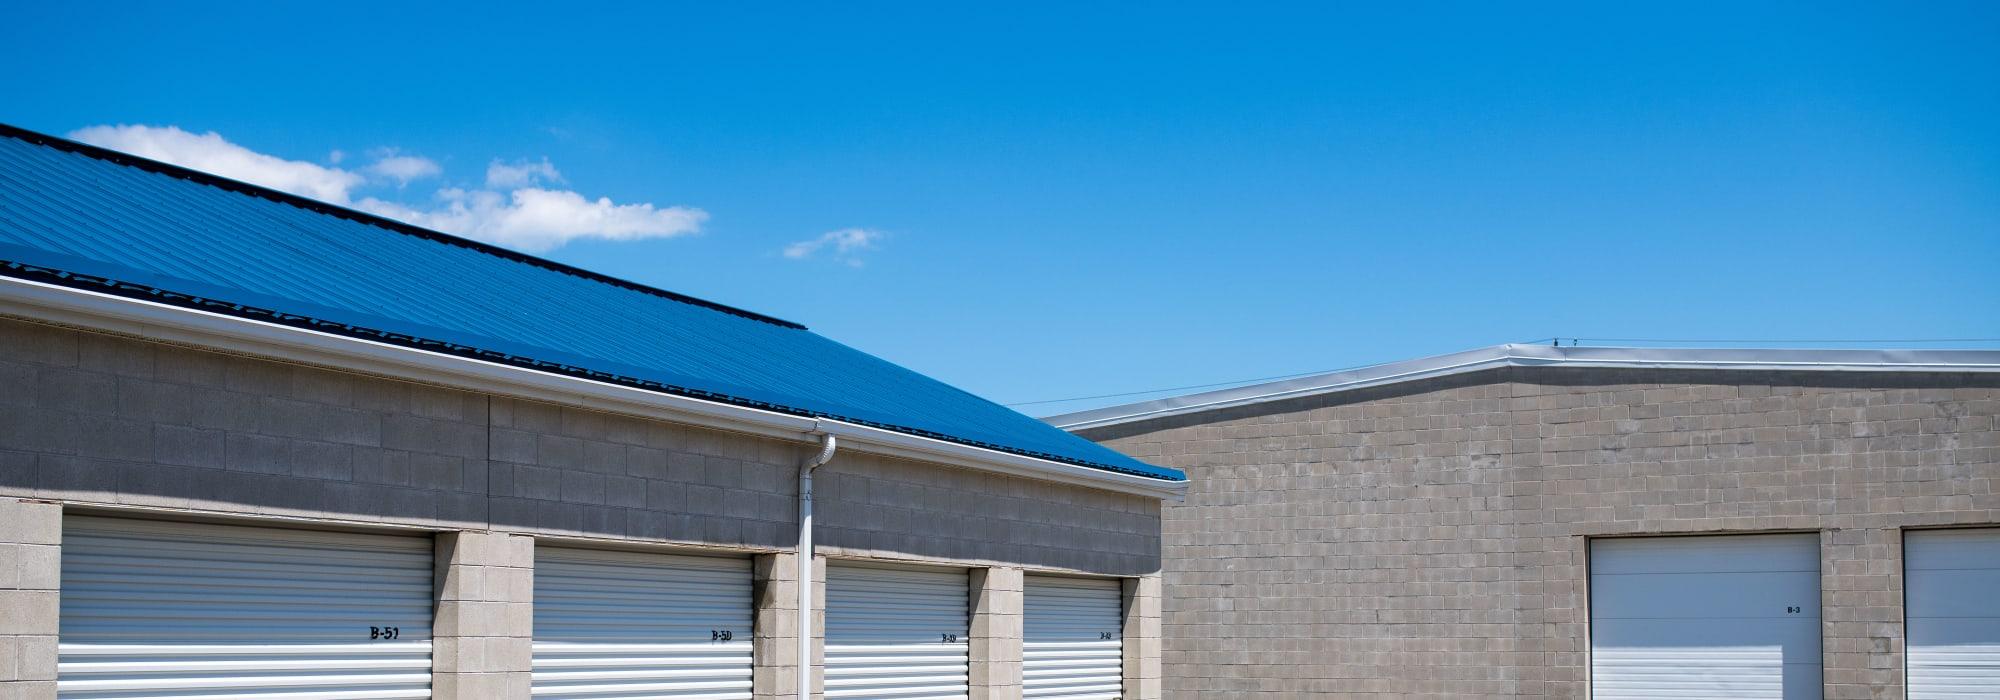 Storage units at Apple Self Storage - St. Catharines in St. Catharines, Ontario